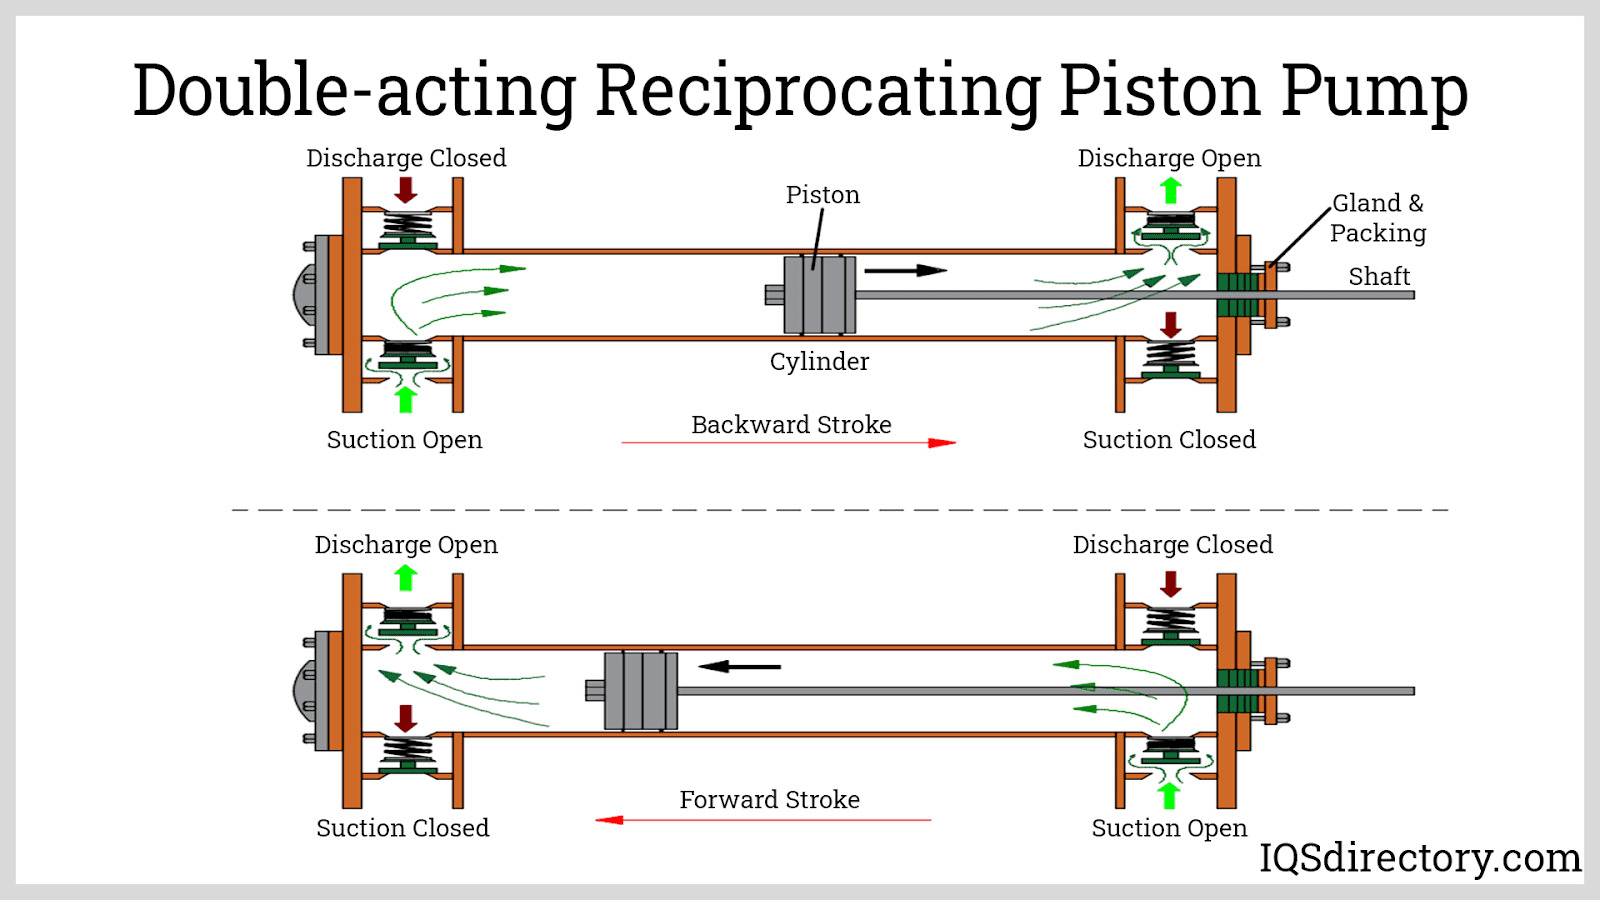 Double-acting Reciprocating Piston Pump